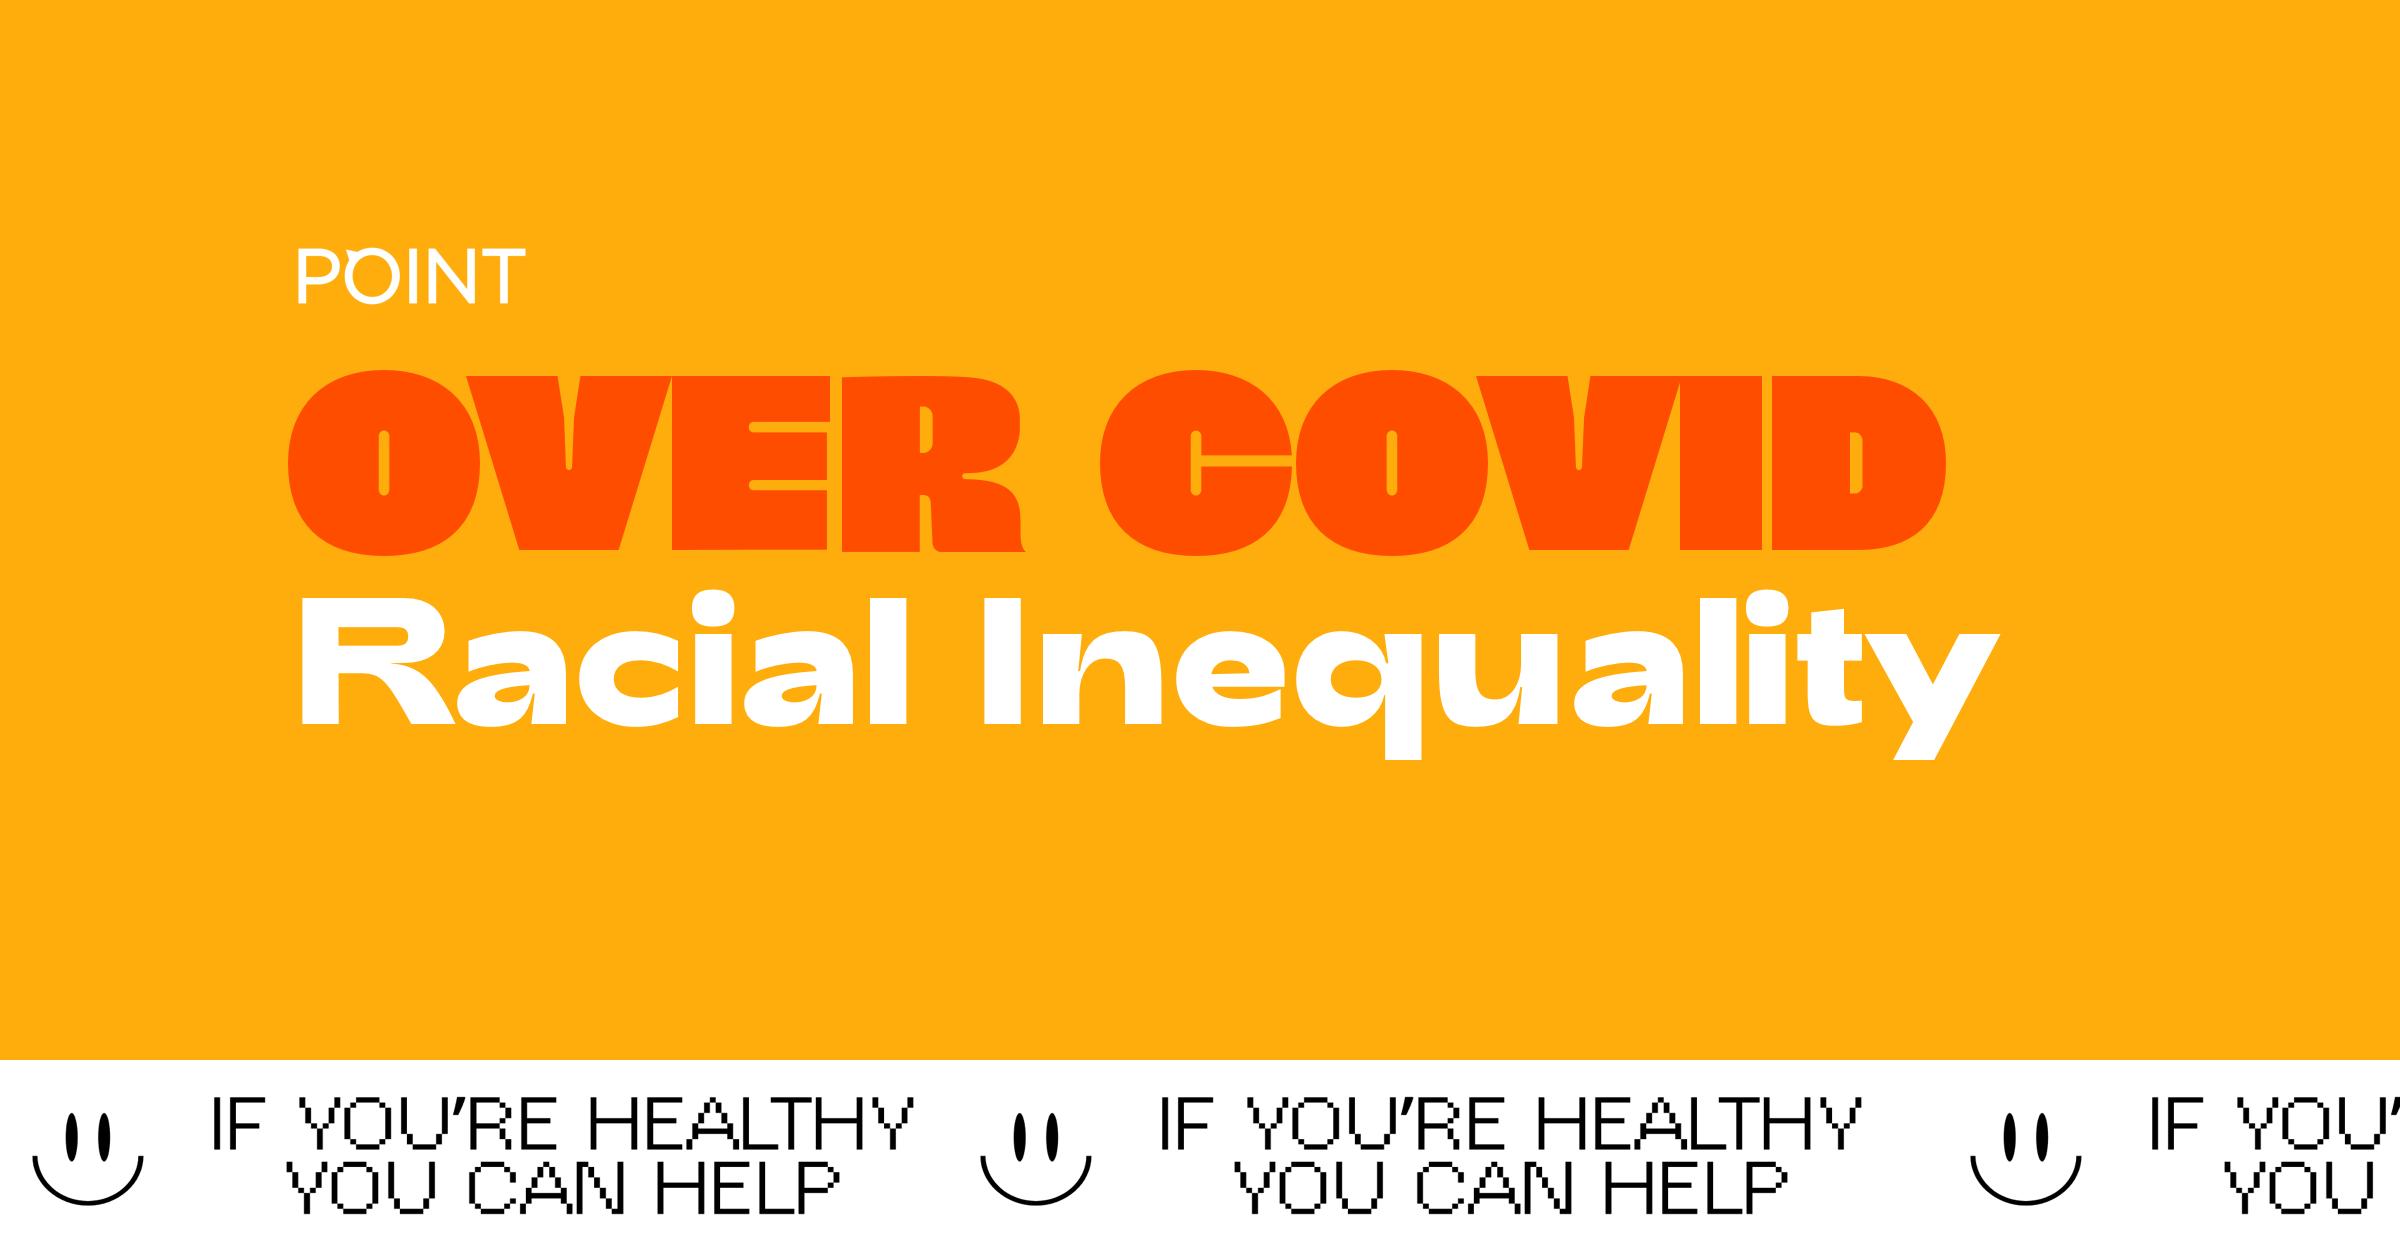 #overCOVID: Racial Inequality